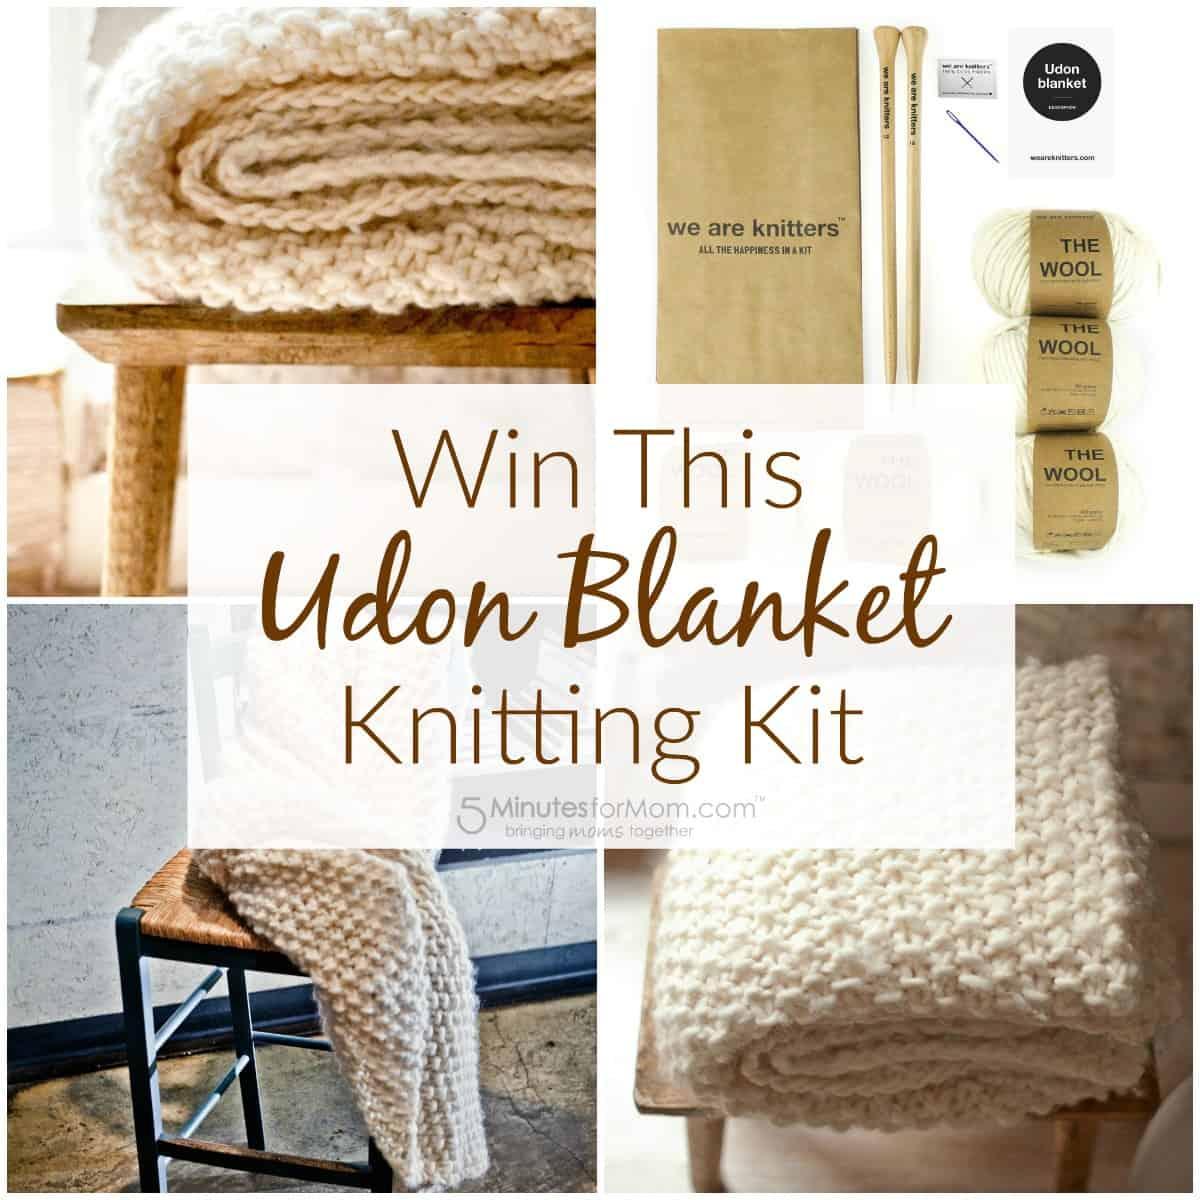 Win this Udon Blanket Knitting Kit